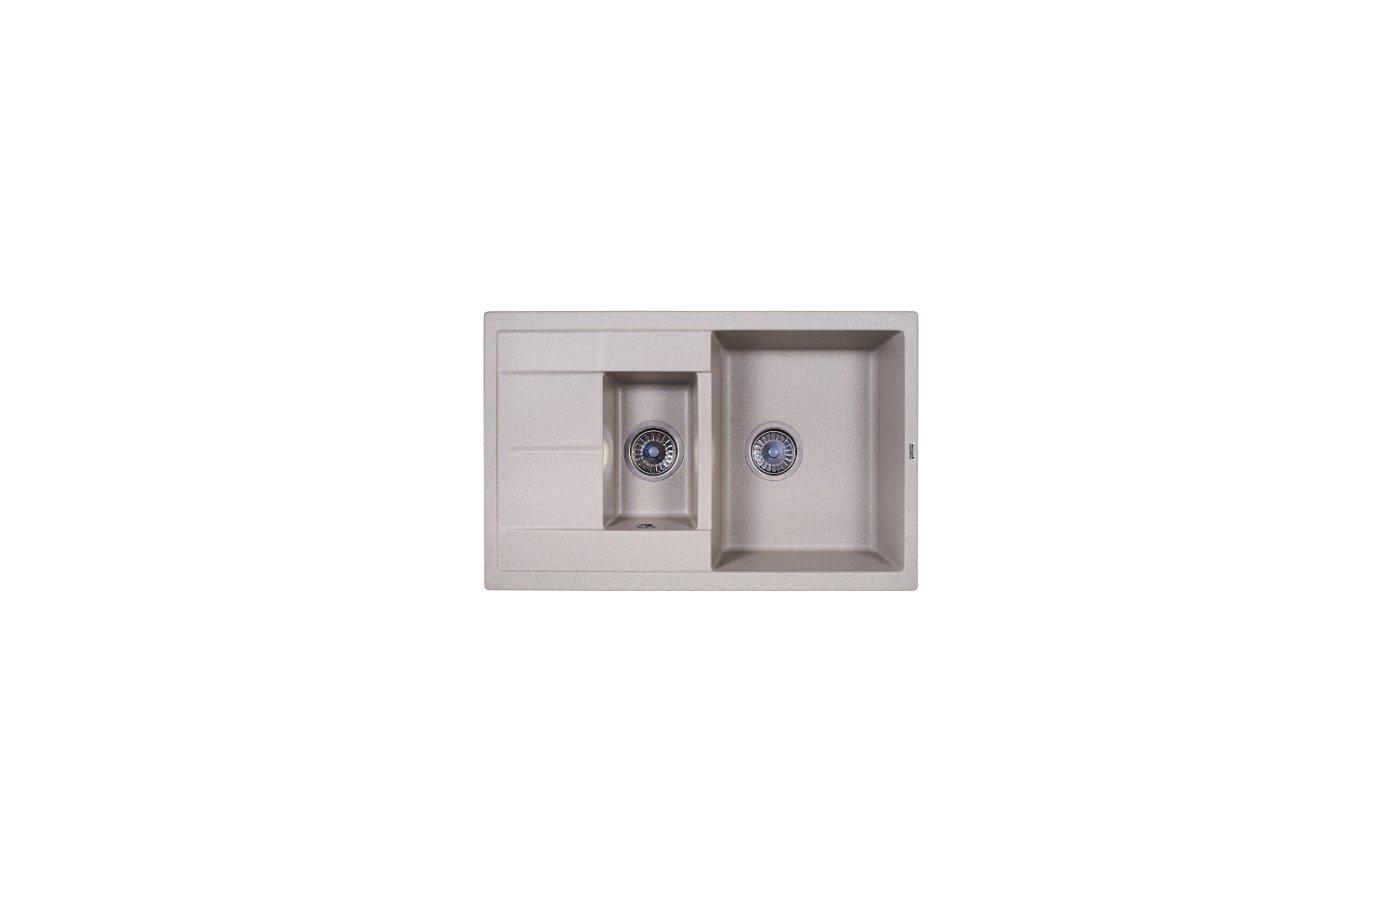 Кухонная мойка Weissgauff QUADRO 775K Eco Granit серый шелк